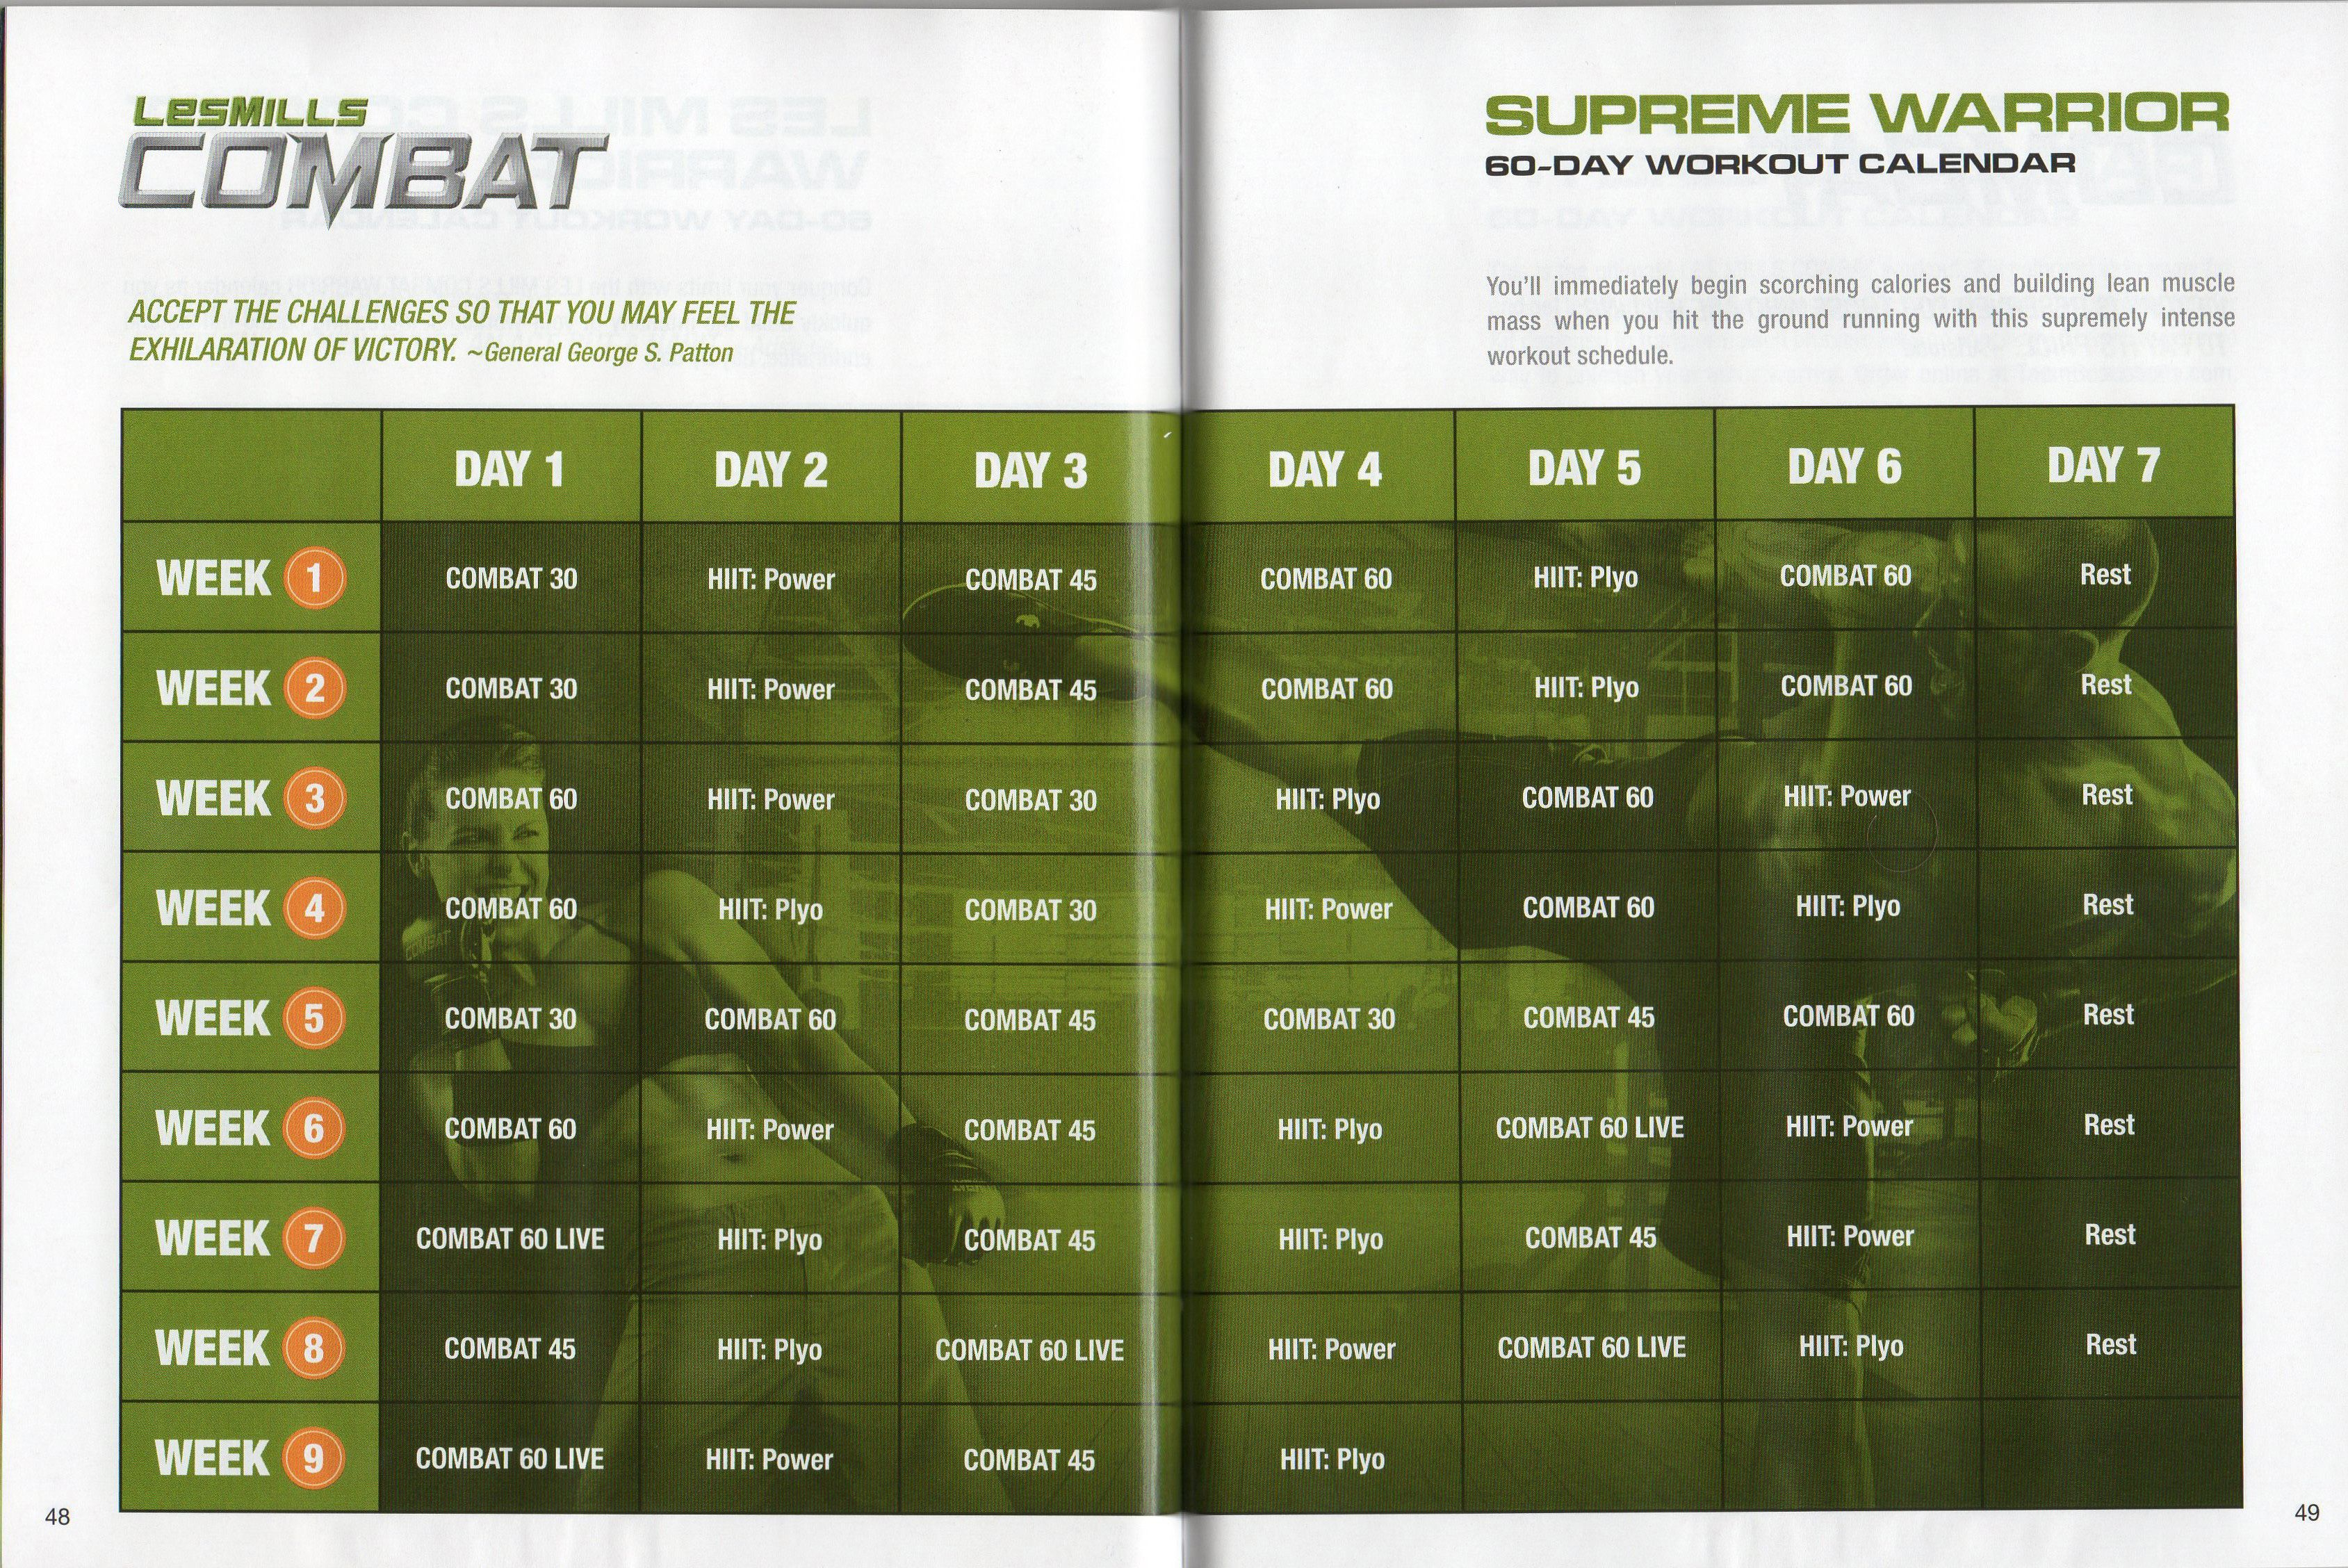 Les Mills Combat ~ 02 ~ 60 Day Supreme Warrior Calendar Throughout Body Combat Workout Schedule